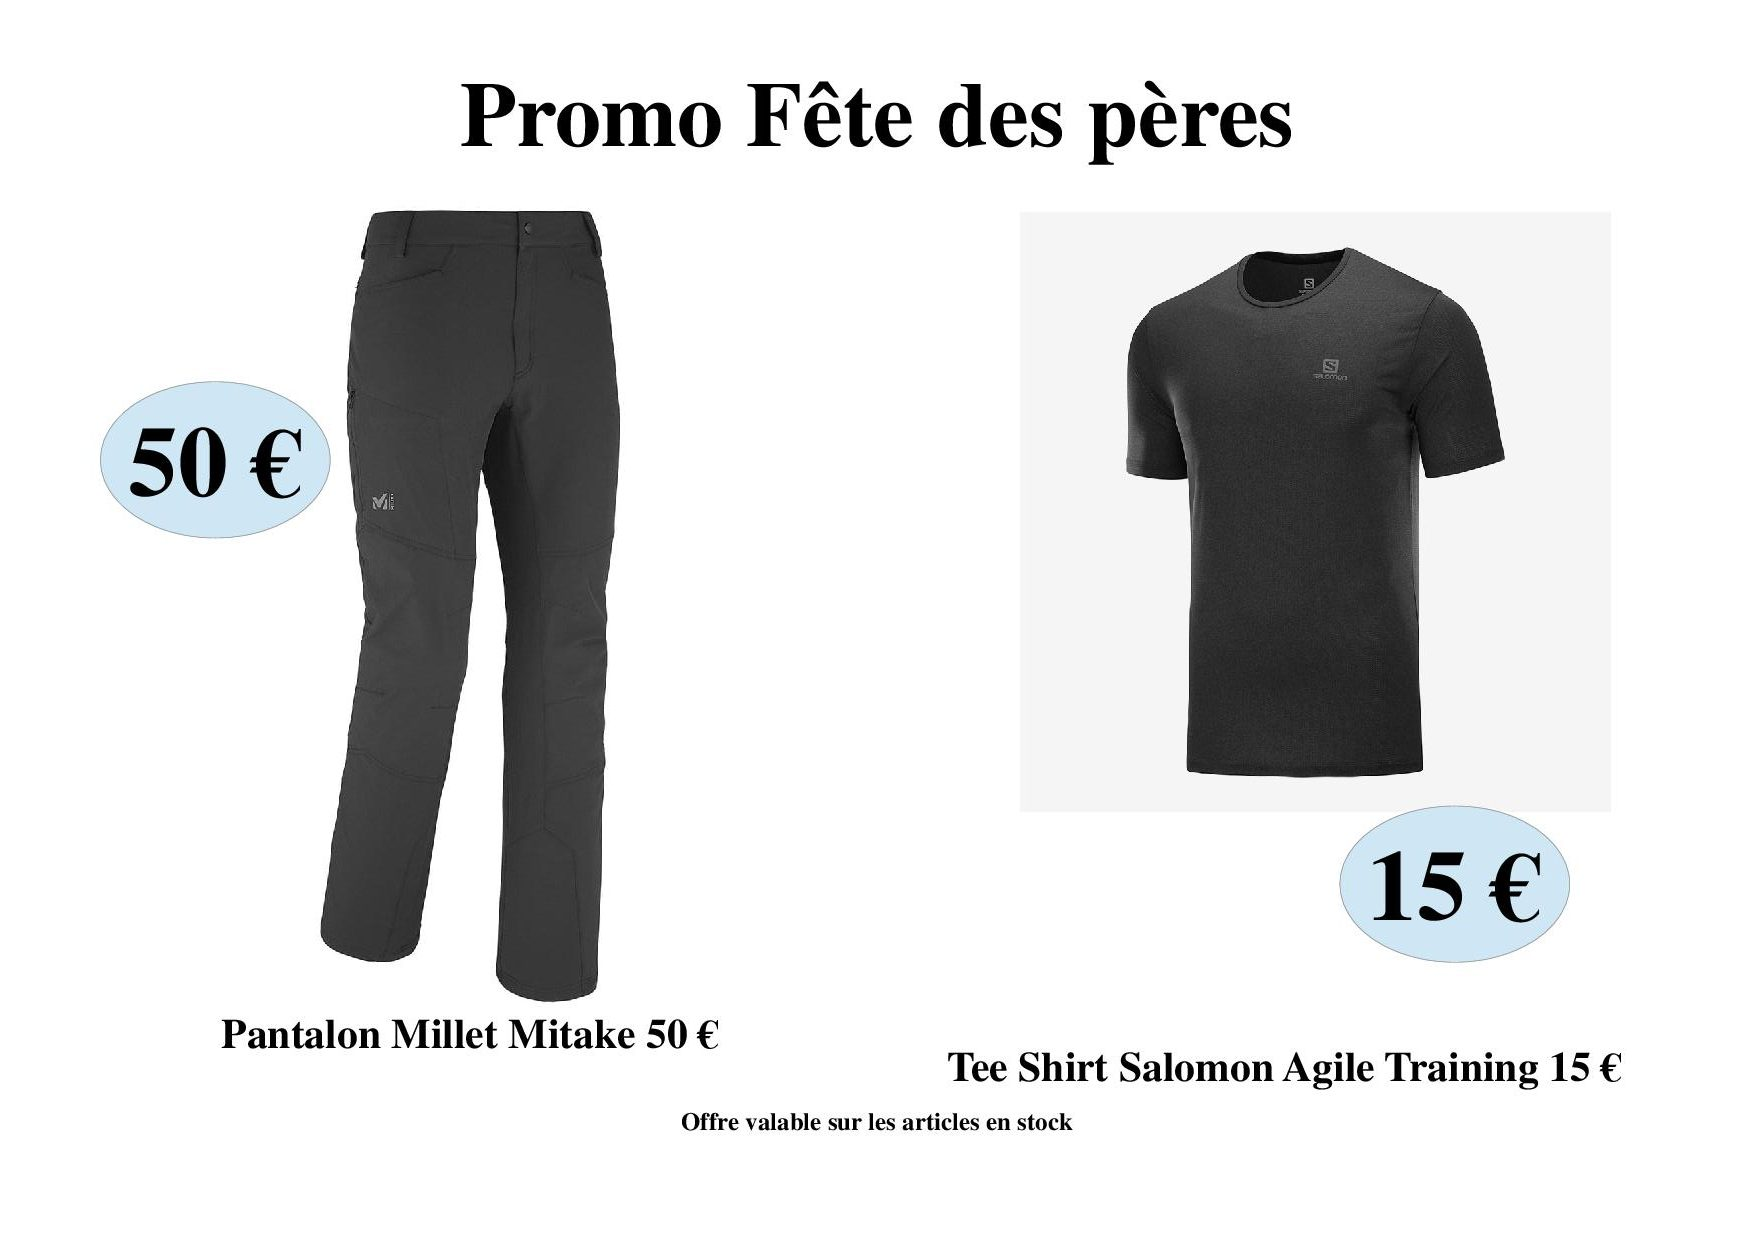 Promo Fête des pères Pantalon Millet 50 € Tee shirt Salomon 15 € #corse #corsica #alti.monti #ajaccio #salomon #running #millet #promo #promotions #trailrunning #trailrunner #montagne #rando #randonnées #isula #muntagnecorse #fetedesperes